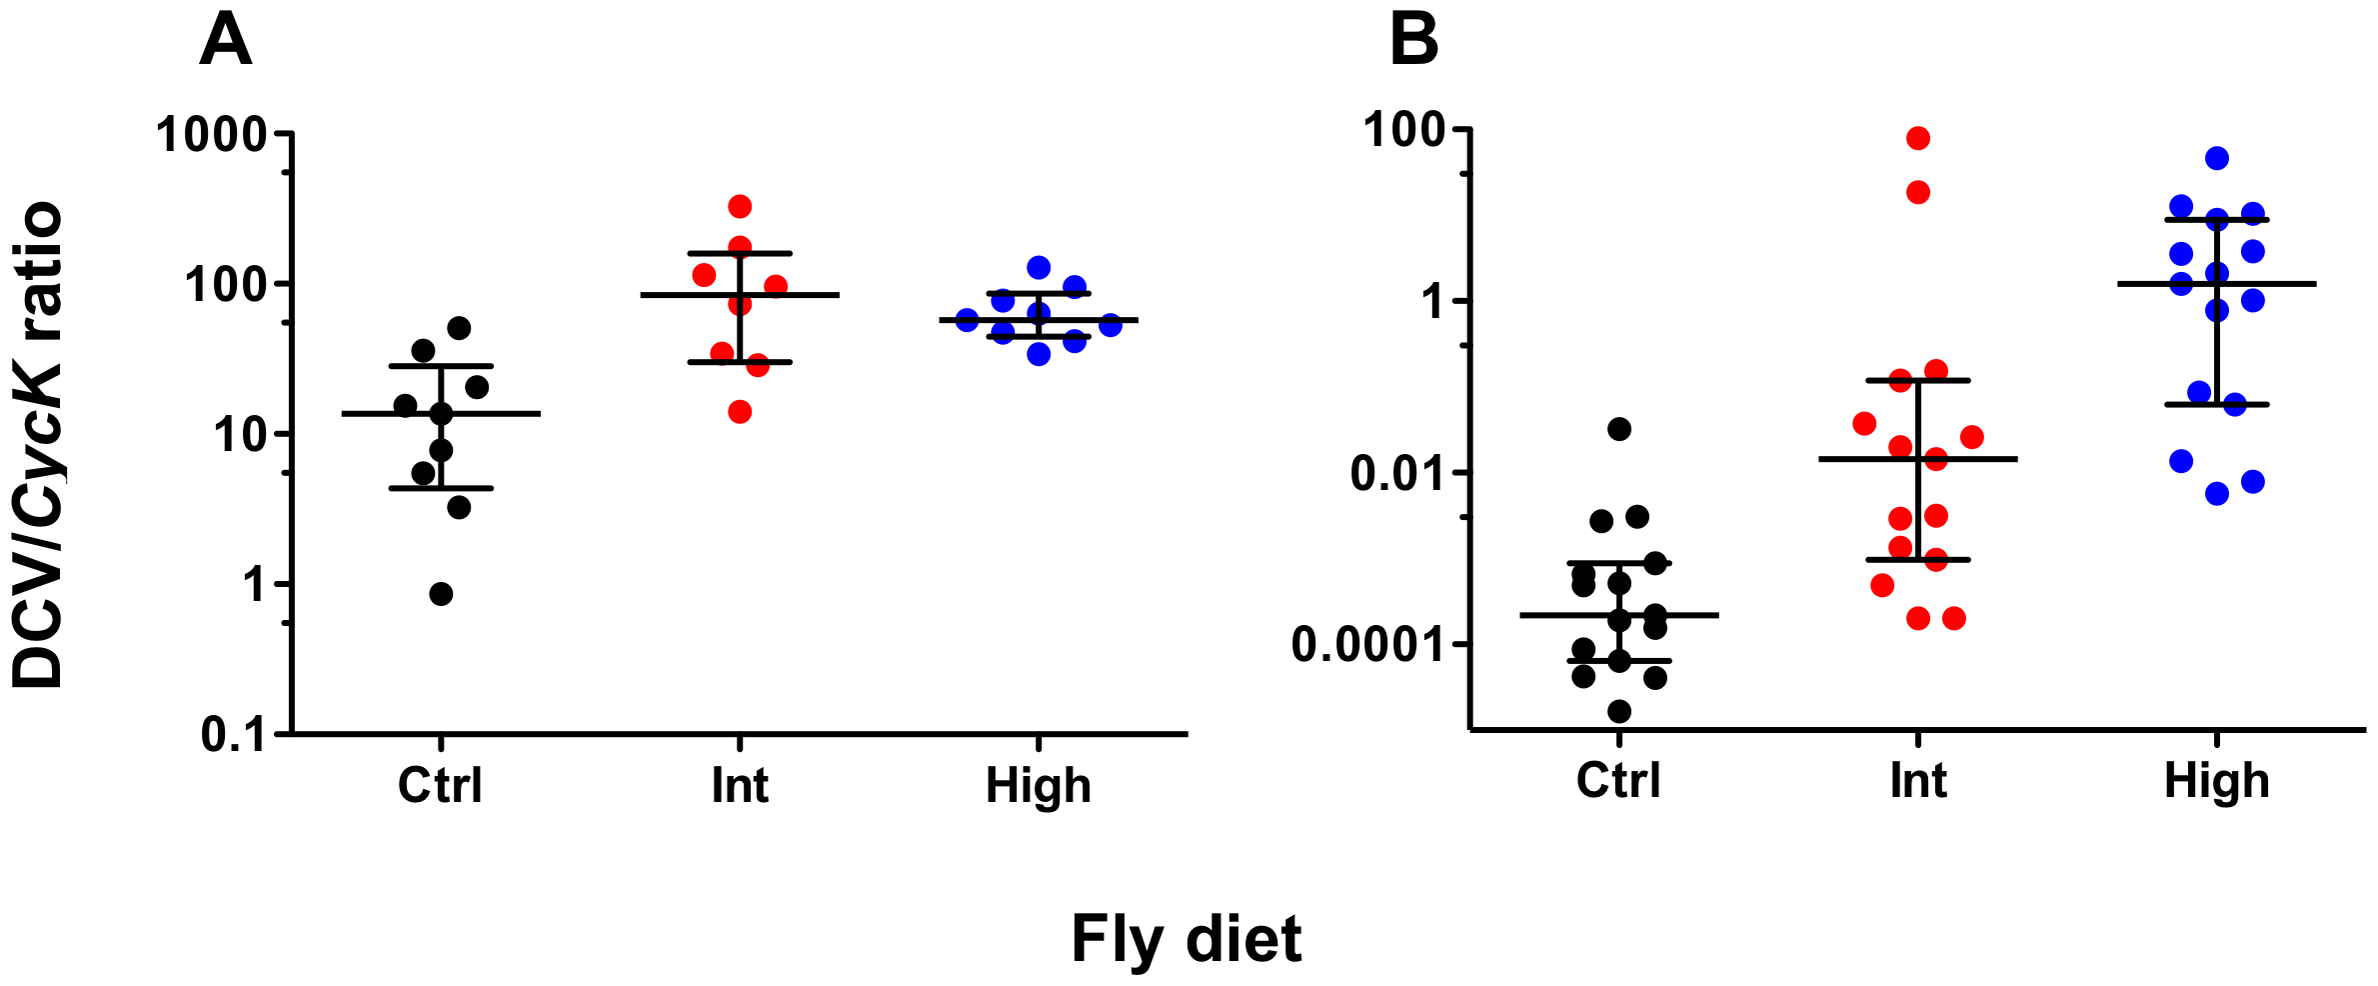 DCV levels of <b><i>Wolbachia</i></b><b>-infected flies fed cholesterol-enriched food.</b>